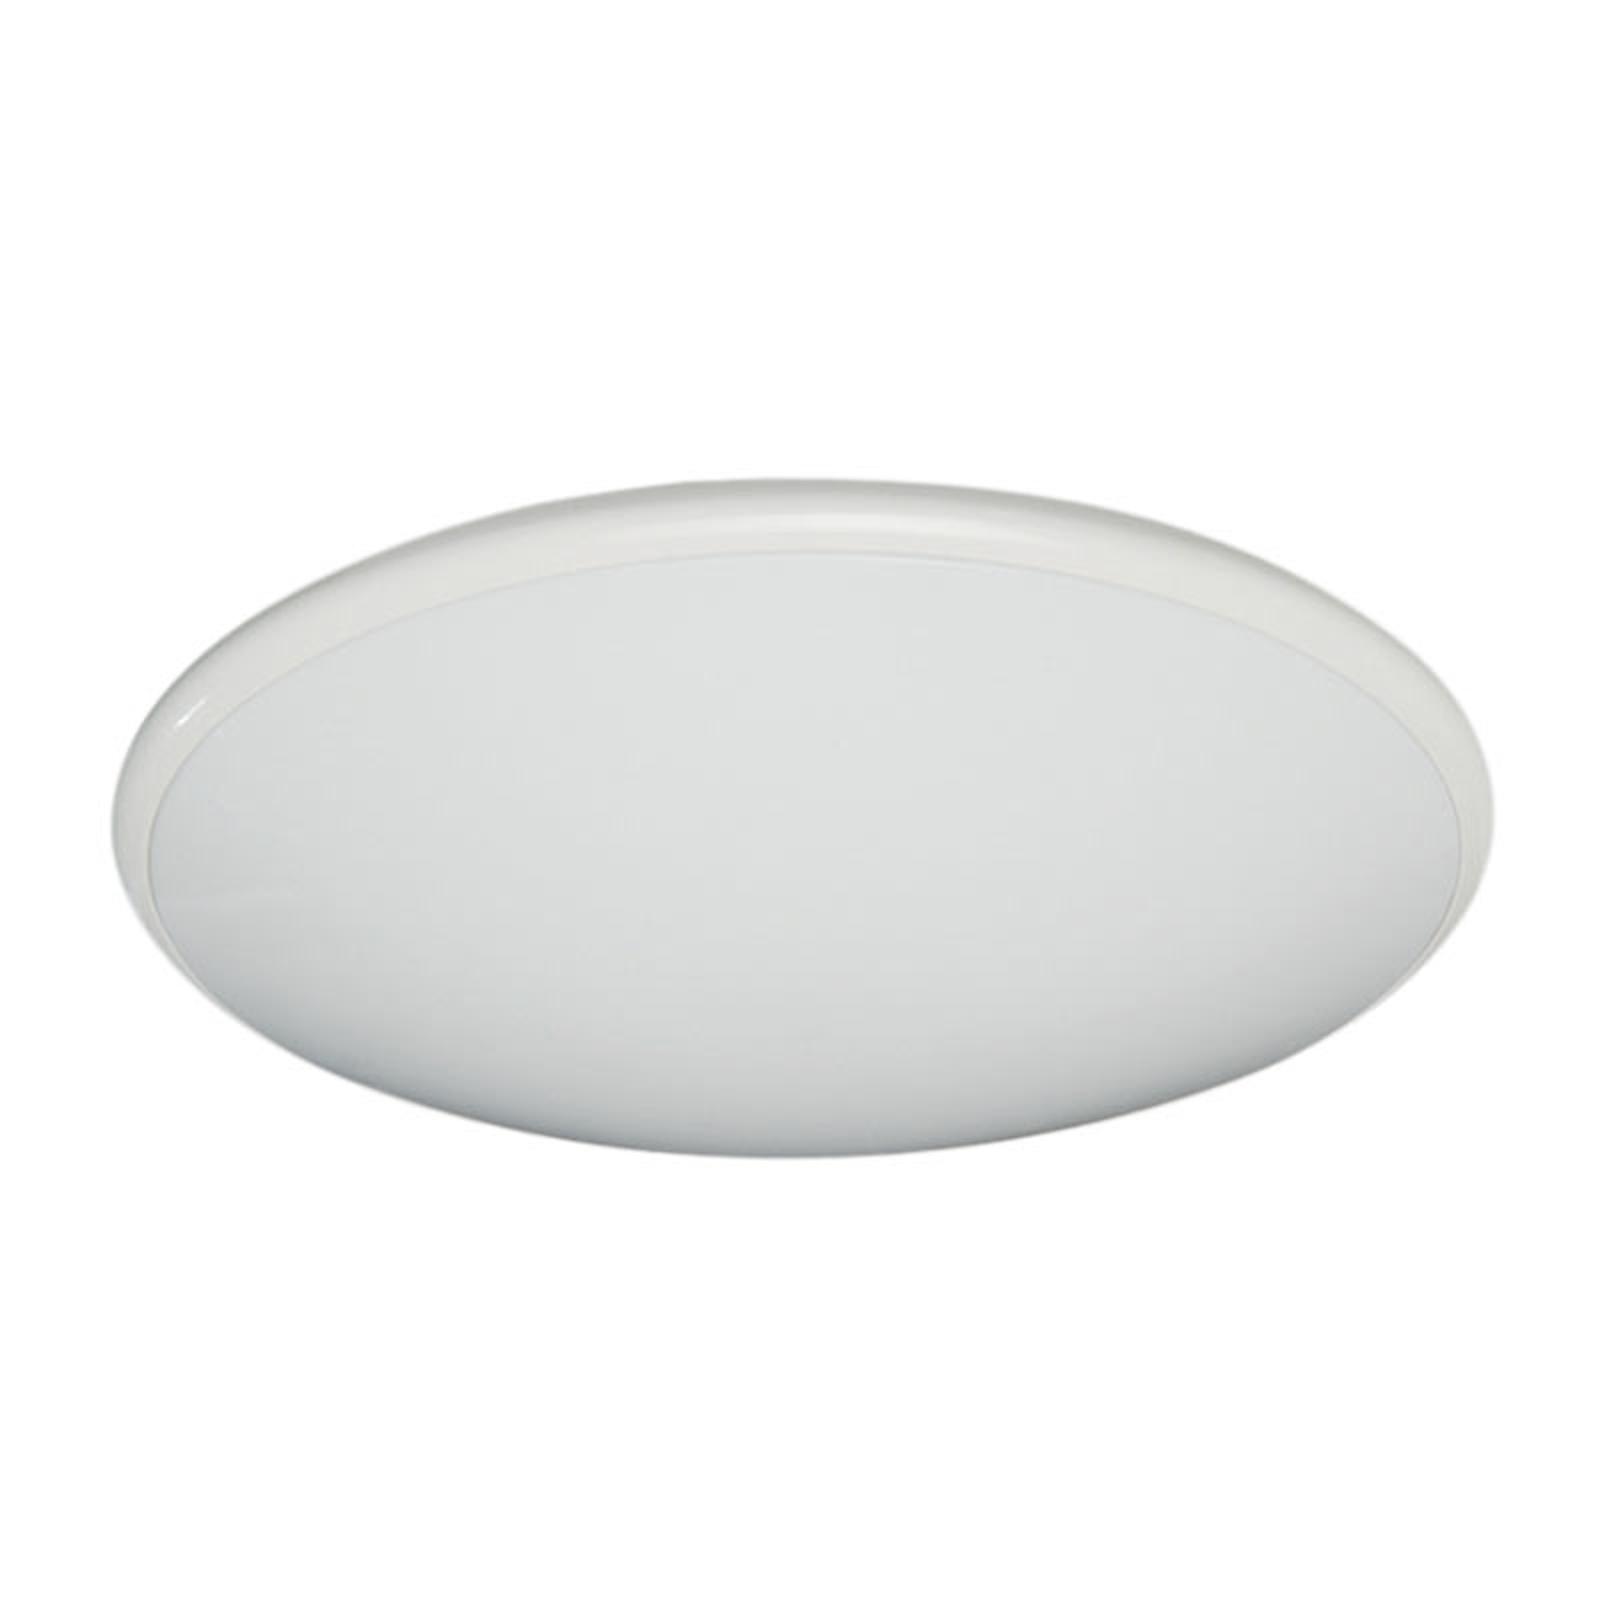 LED-kattolamppu Sinus-S425 1000 HF 42,5cm 3 000 K